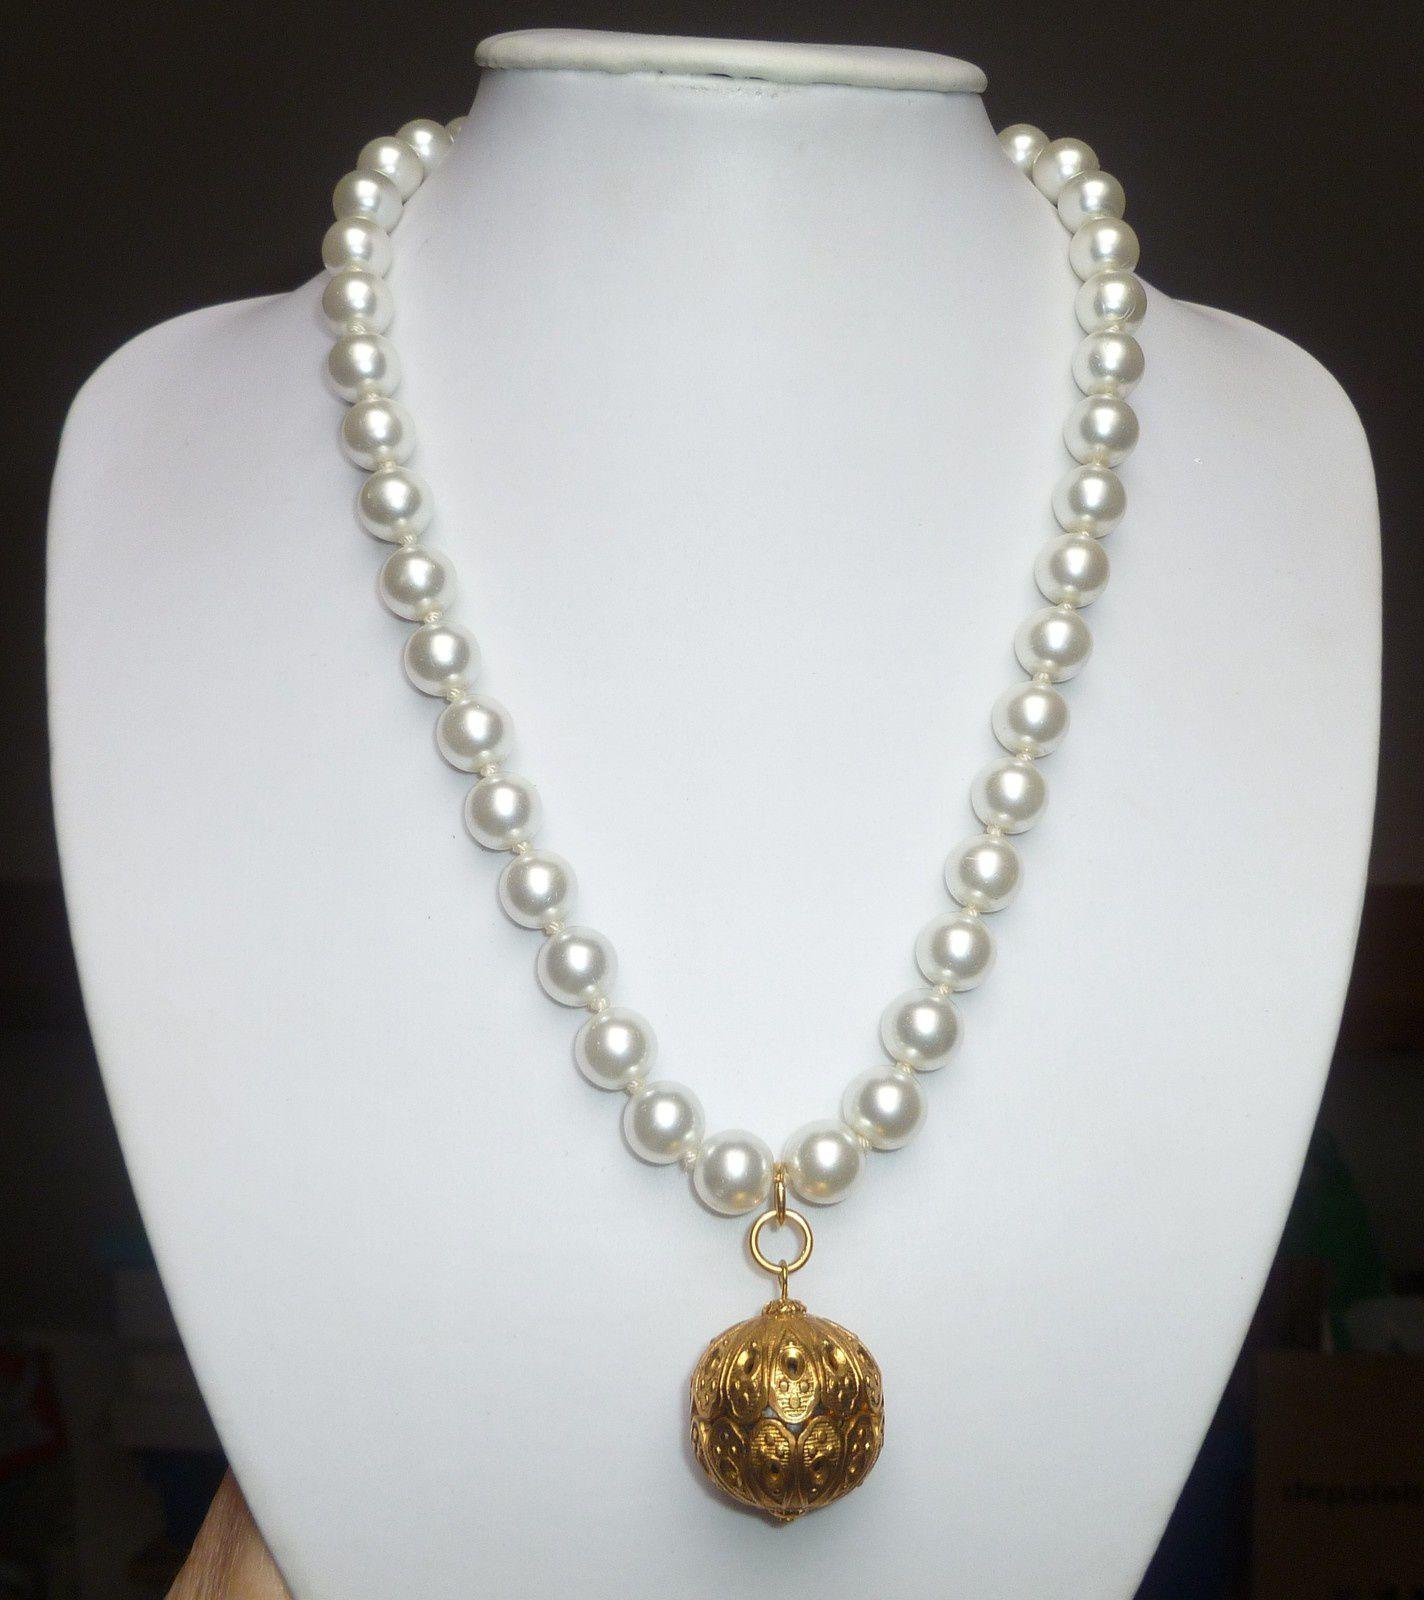 collier de perles et breloque doré.